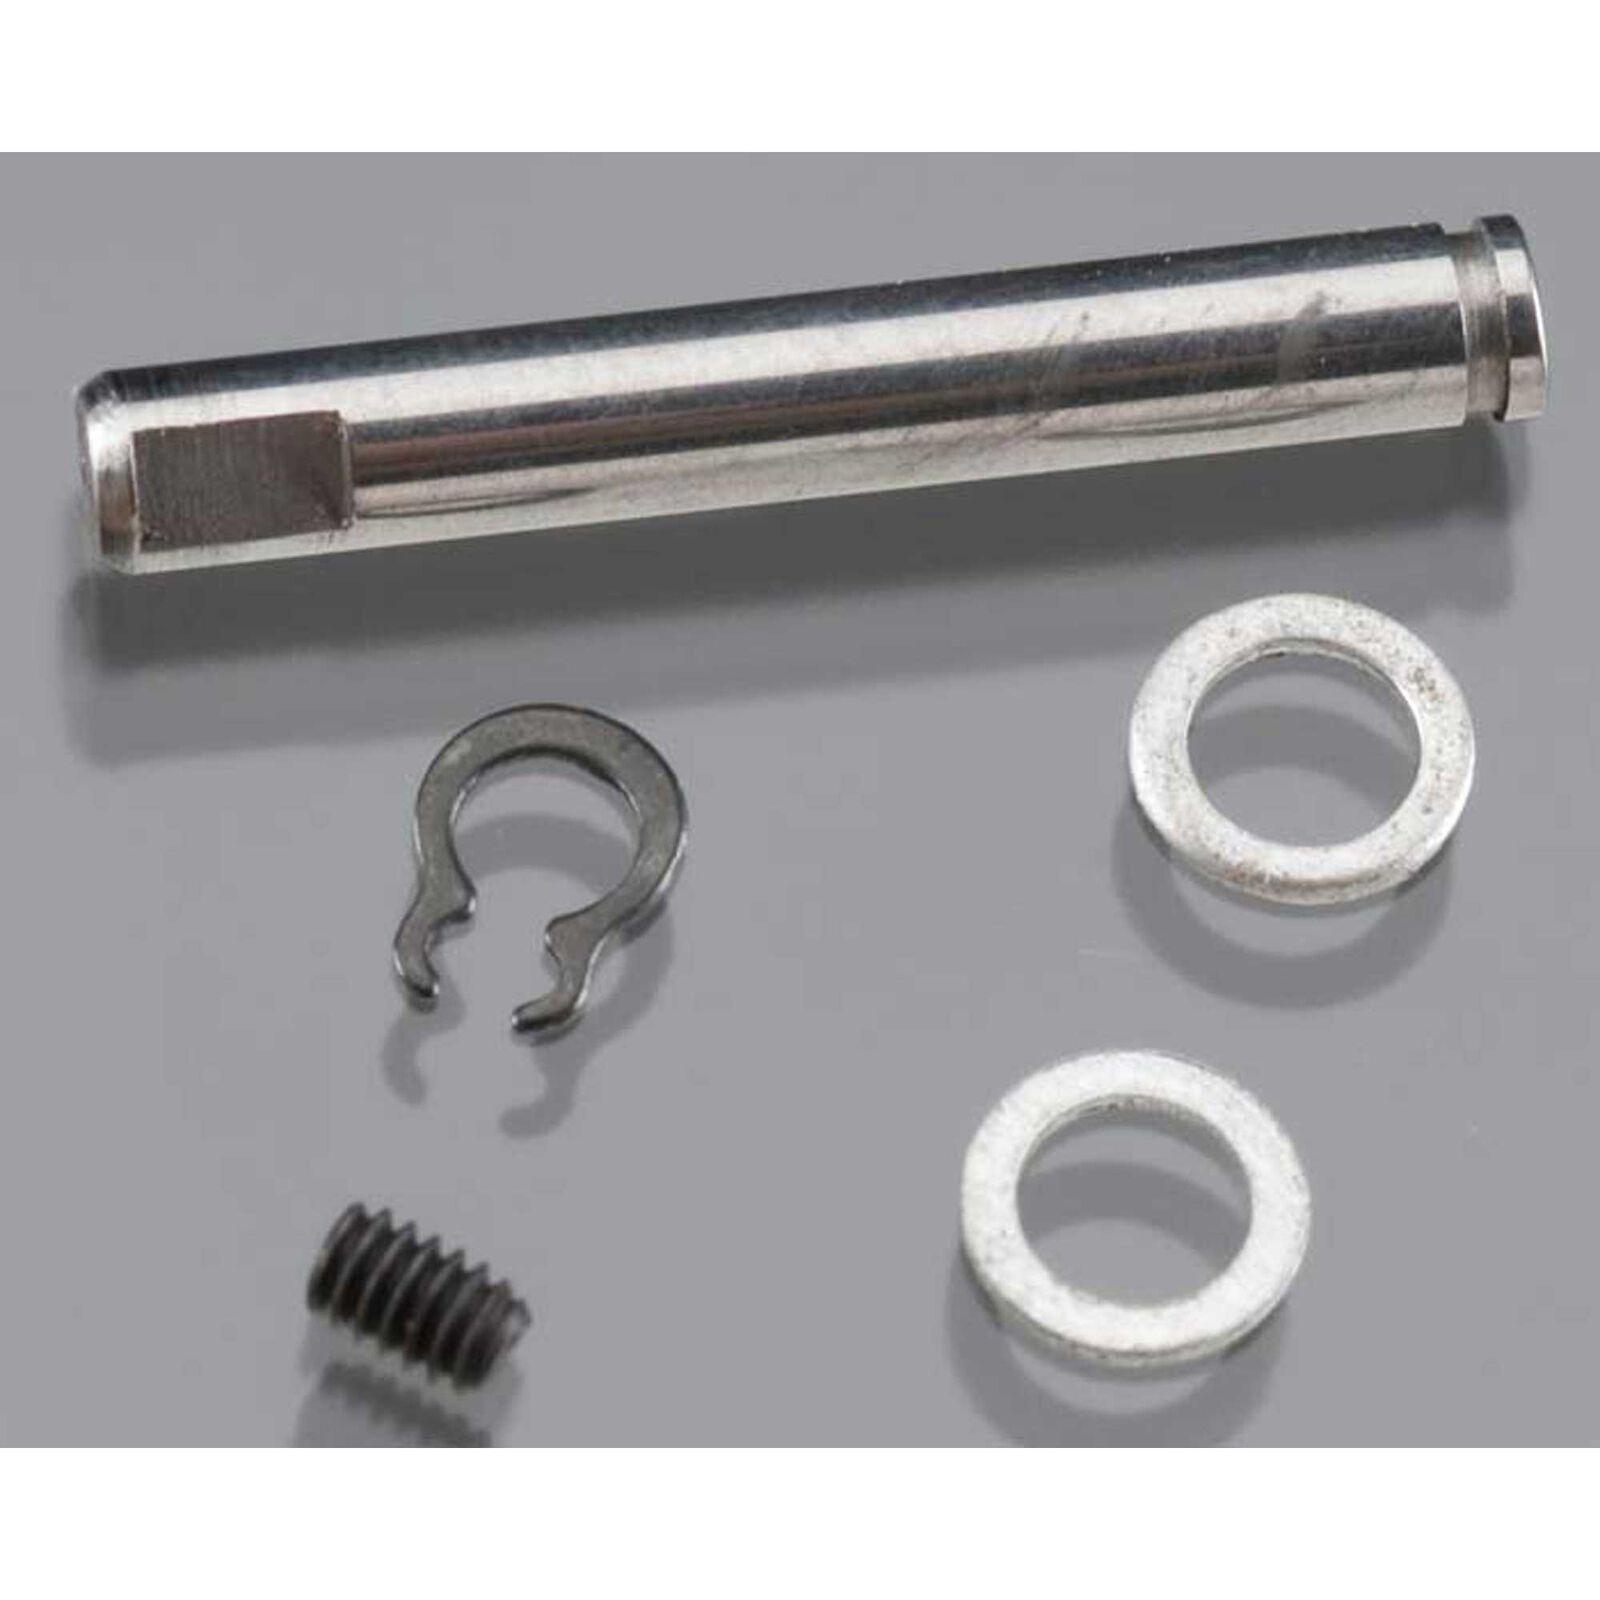 Rimfire 250 28-16-1750 Replacement Shaft